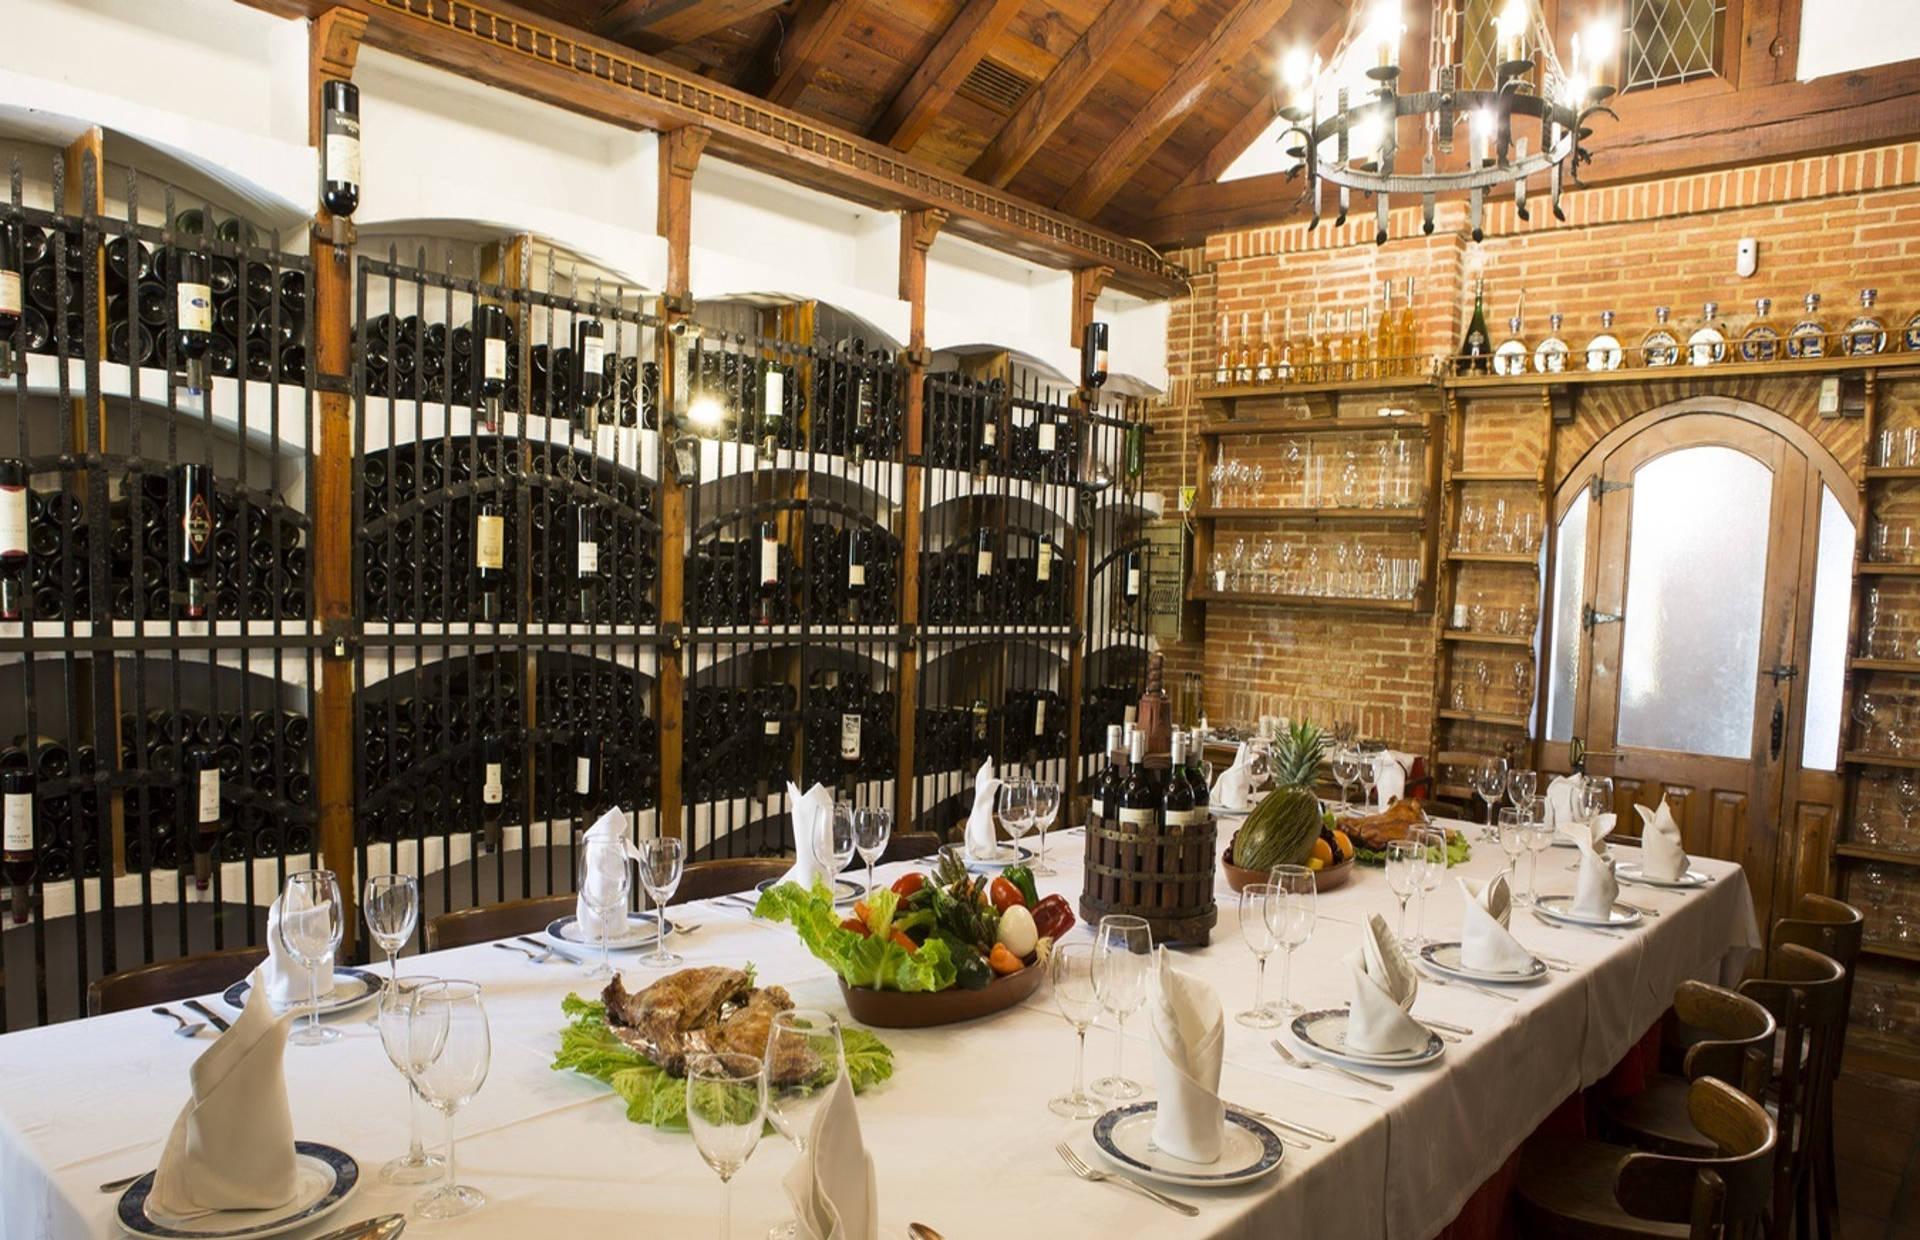 Imagen de la bodega de vino del Asador El Molino Madrid Plaza de Castilla